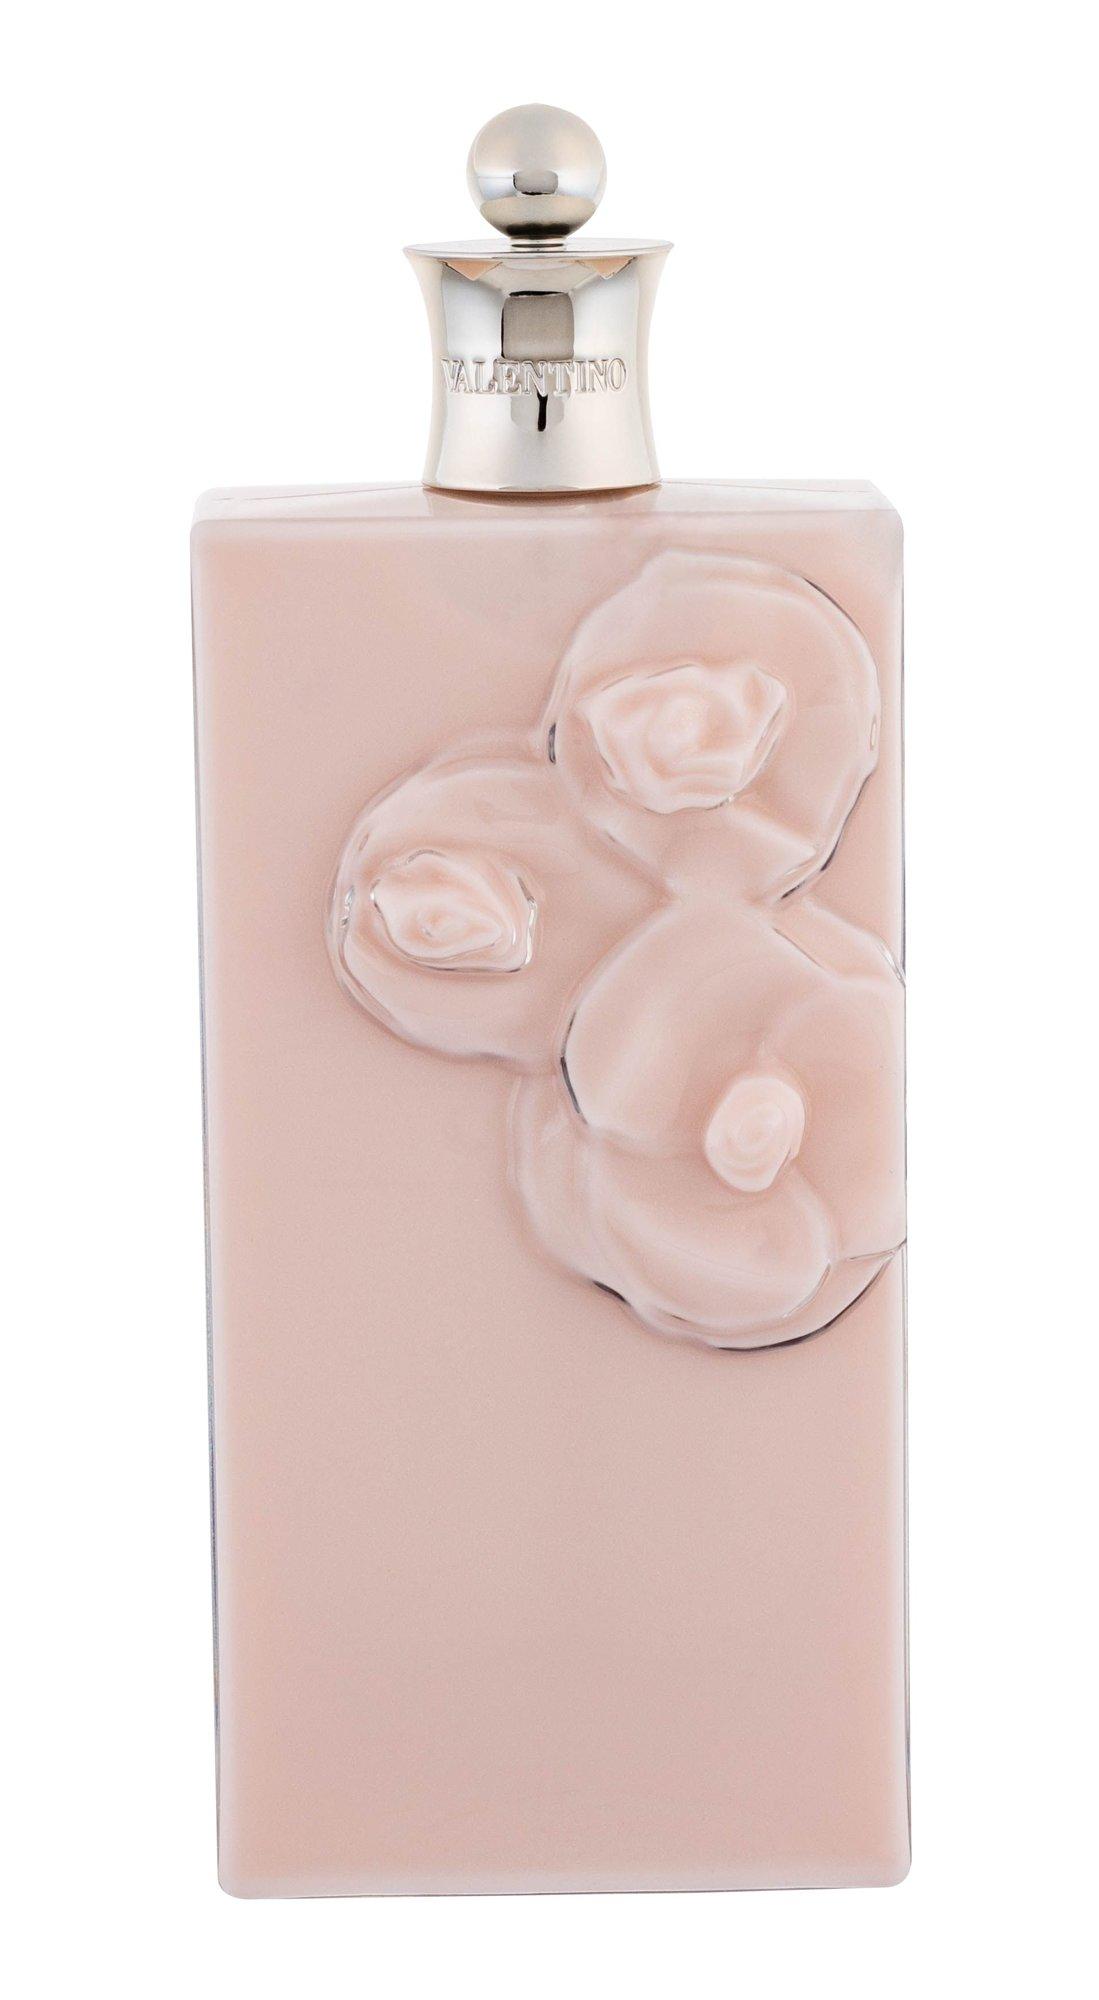 Valentino Valentina Body lotion 200ml